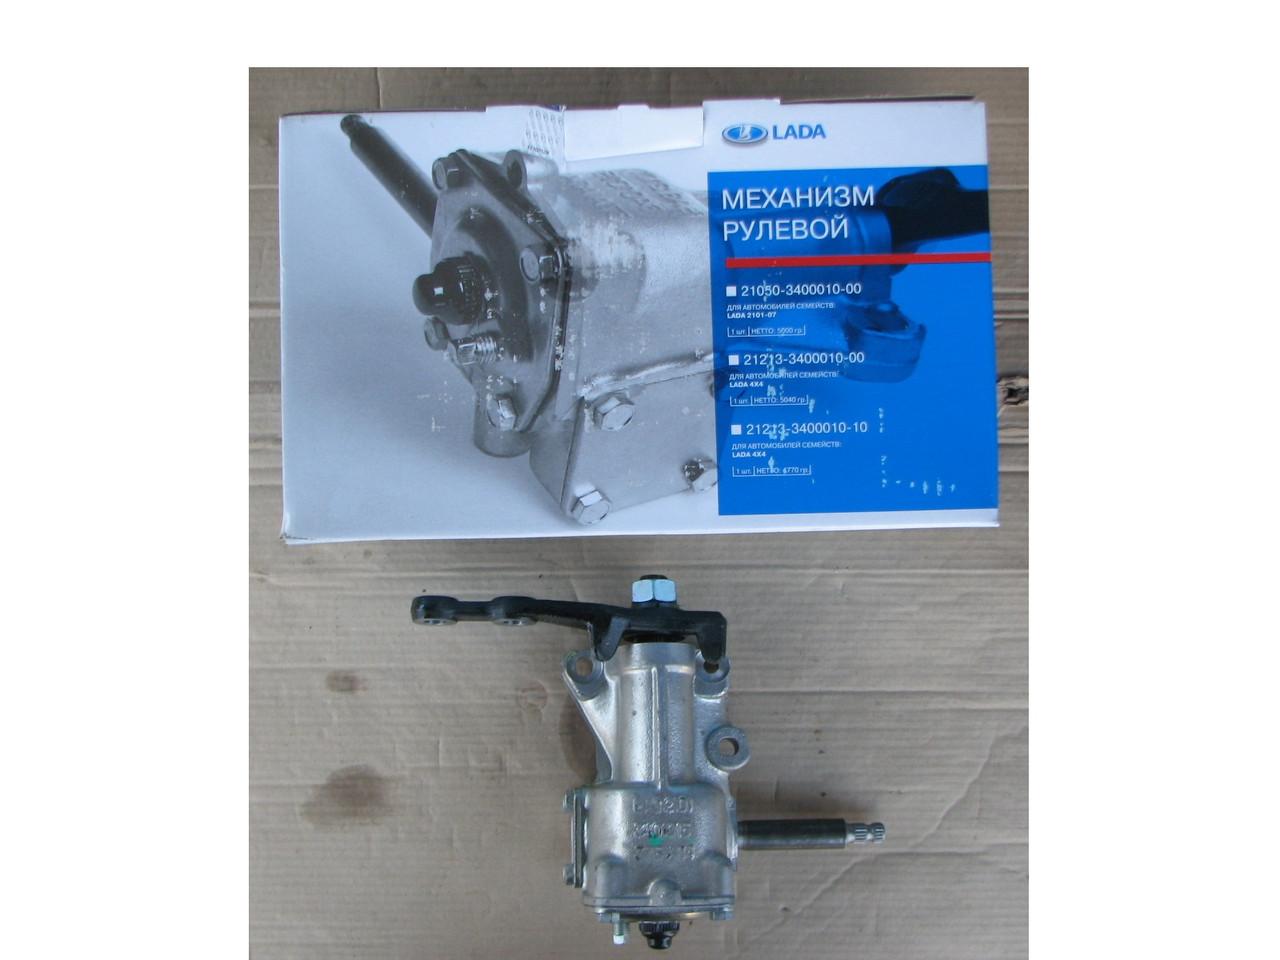 Механизм рулевой (короткий вал) ВАЗ 2121,ВАЗ 21213 АвтоВаз